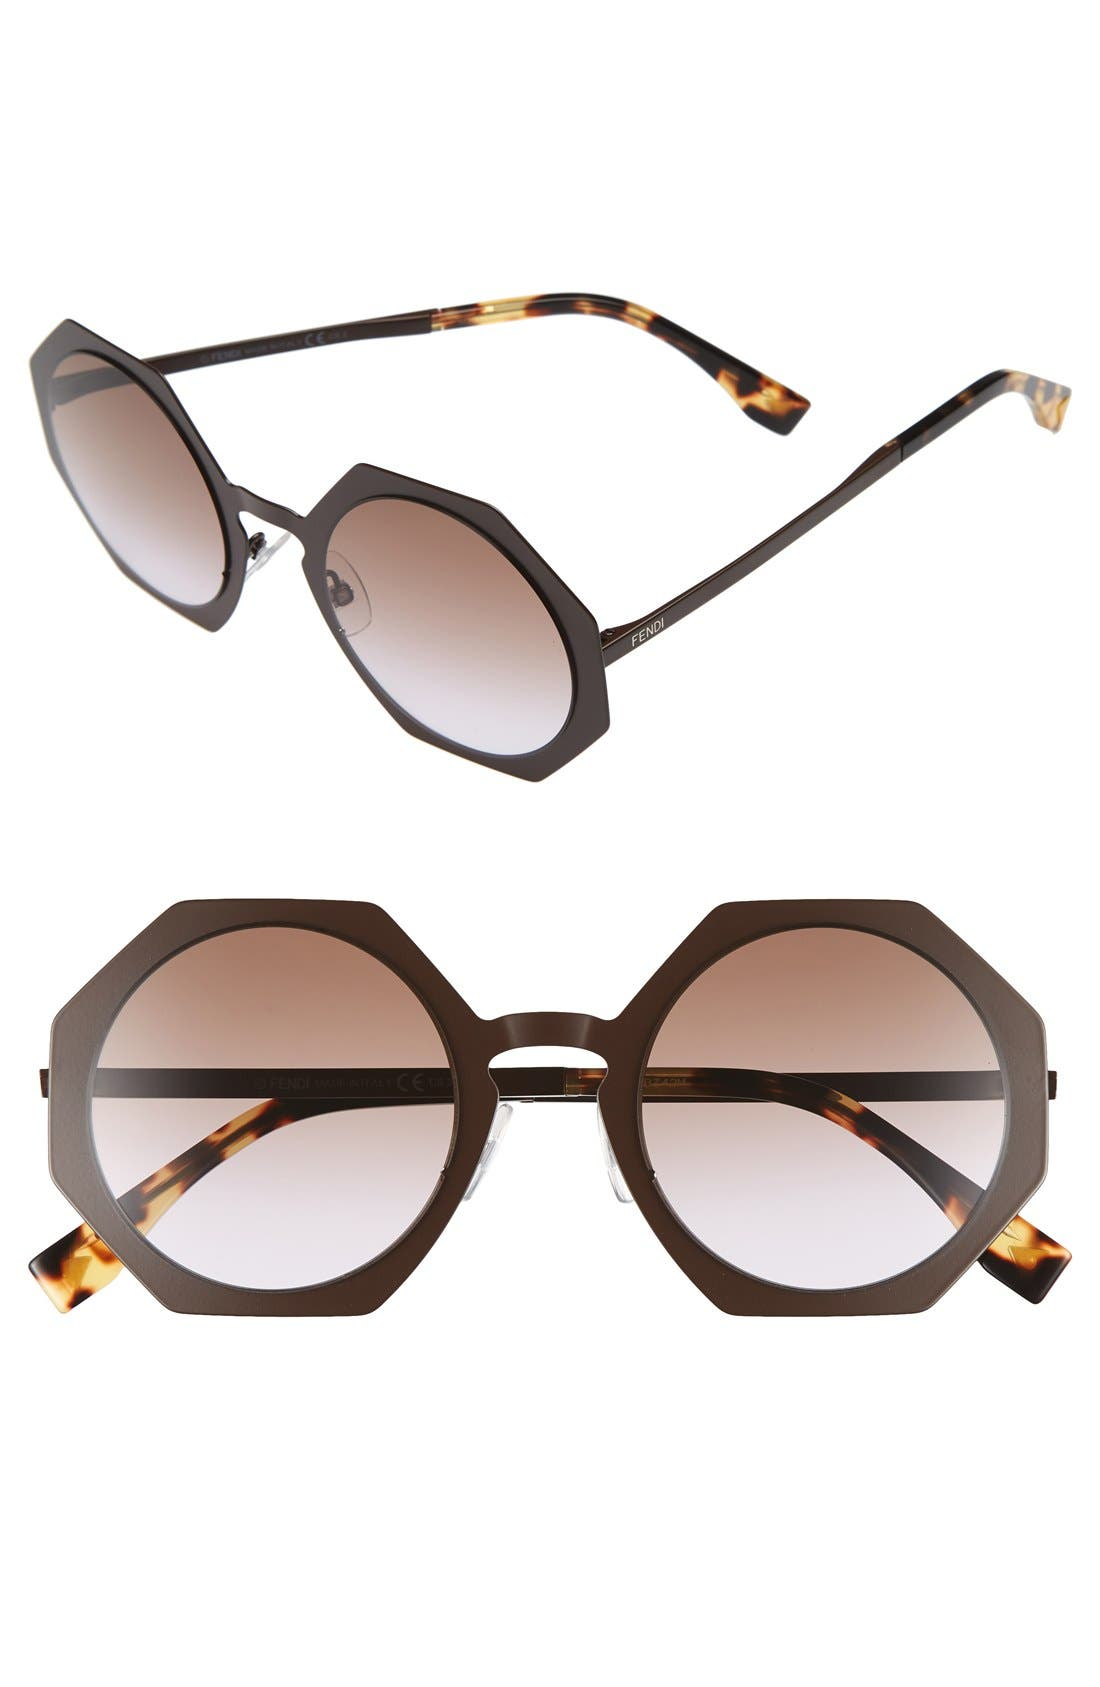 51mm Retro Octagon Sunglasses,                             Main thumbnail 1, color,                             Brown